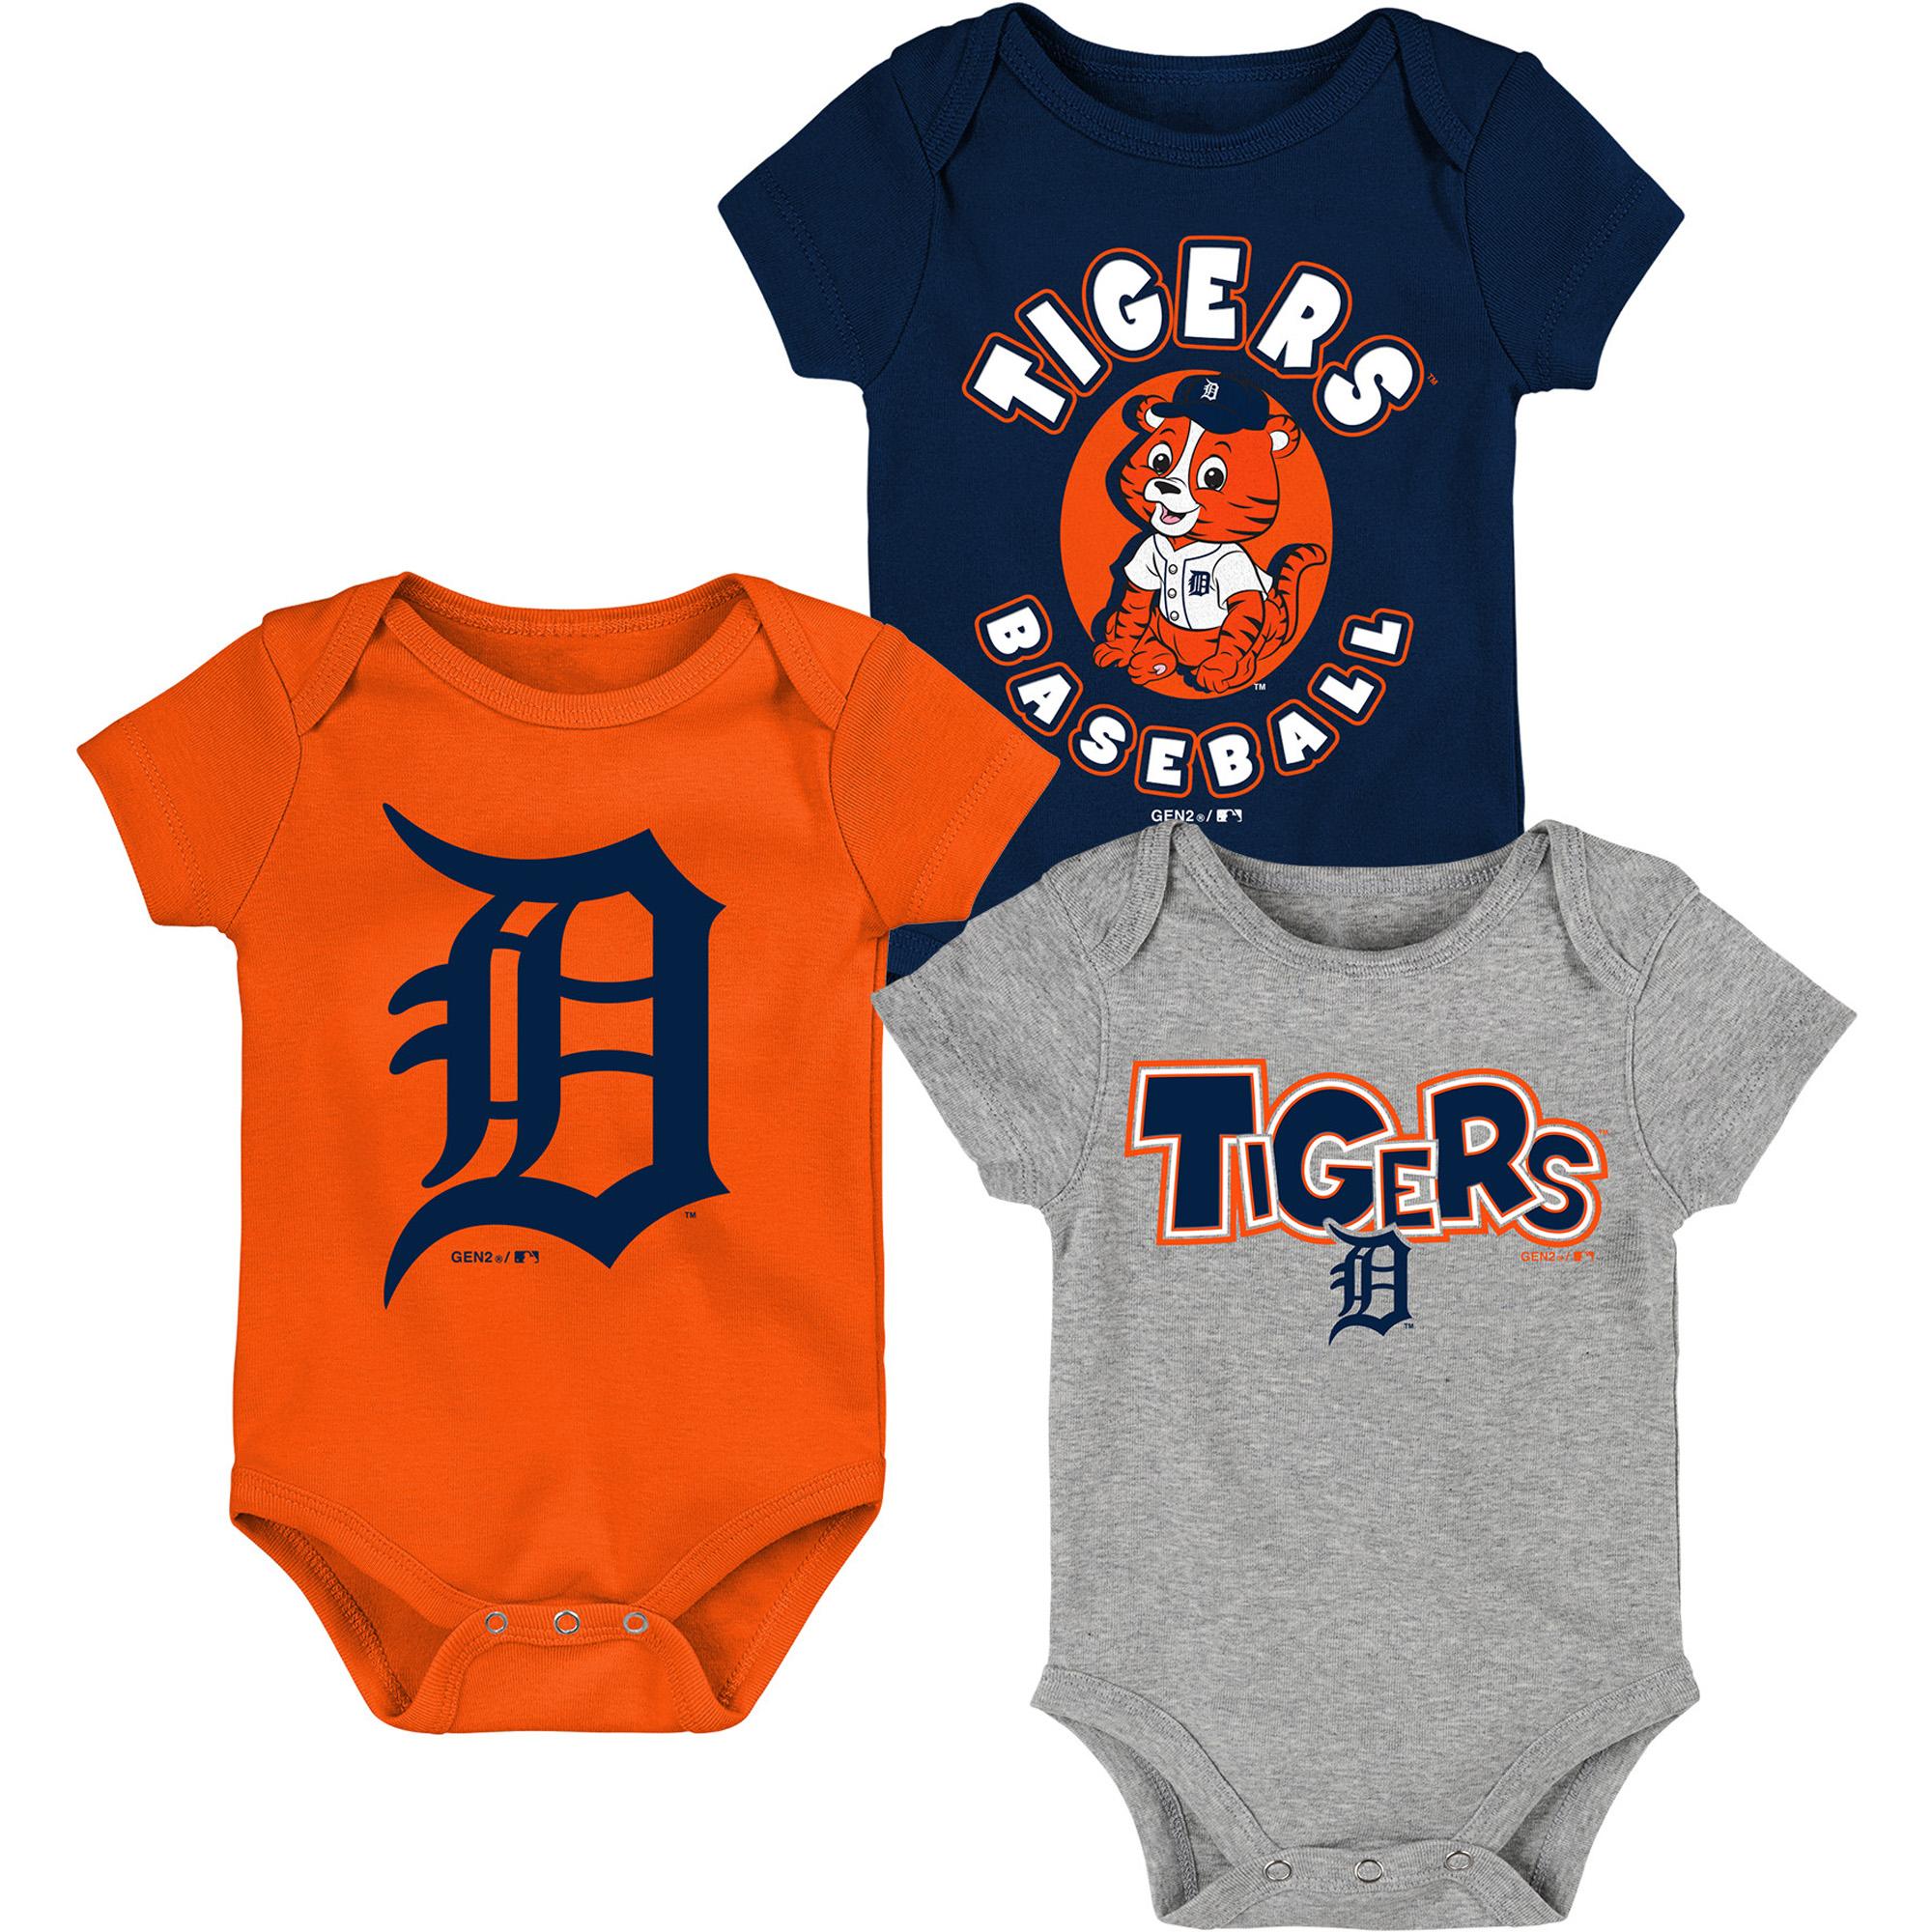 Detroit Tigers Infant Everyday Fan Three-Pack Bodysuit Set - Navy/Orange/Heathered Gray